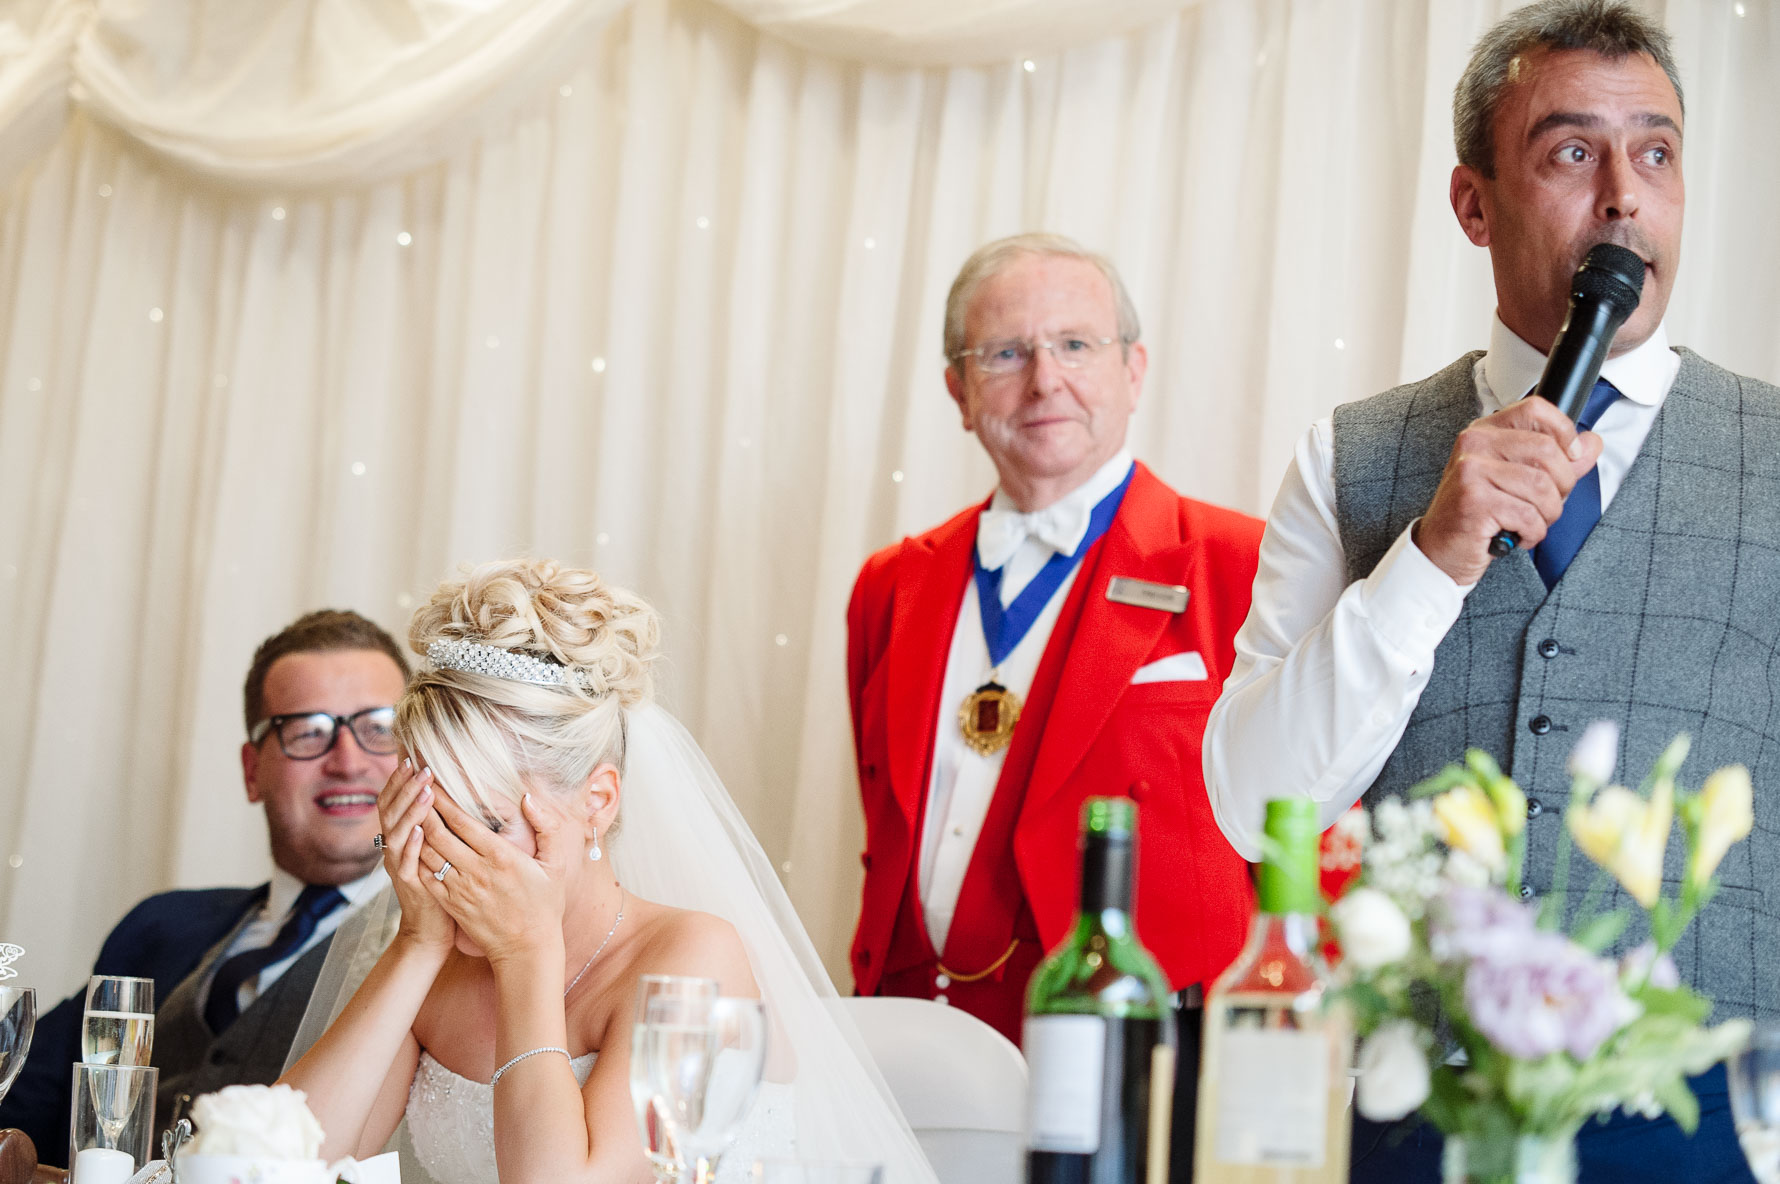 Canterbury Cathedral Lodge Wedding85-20141004 1582